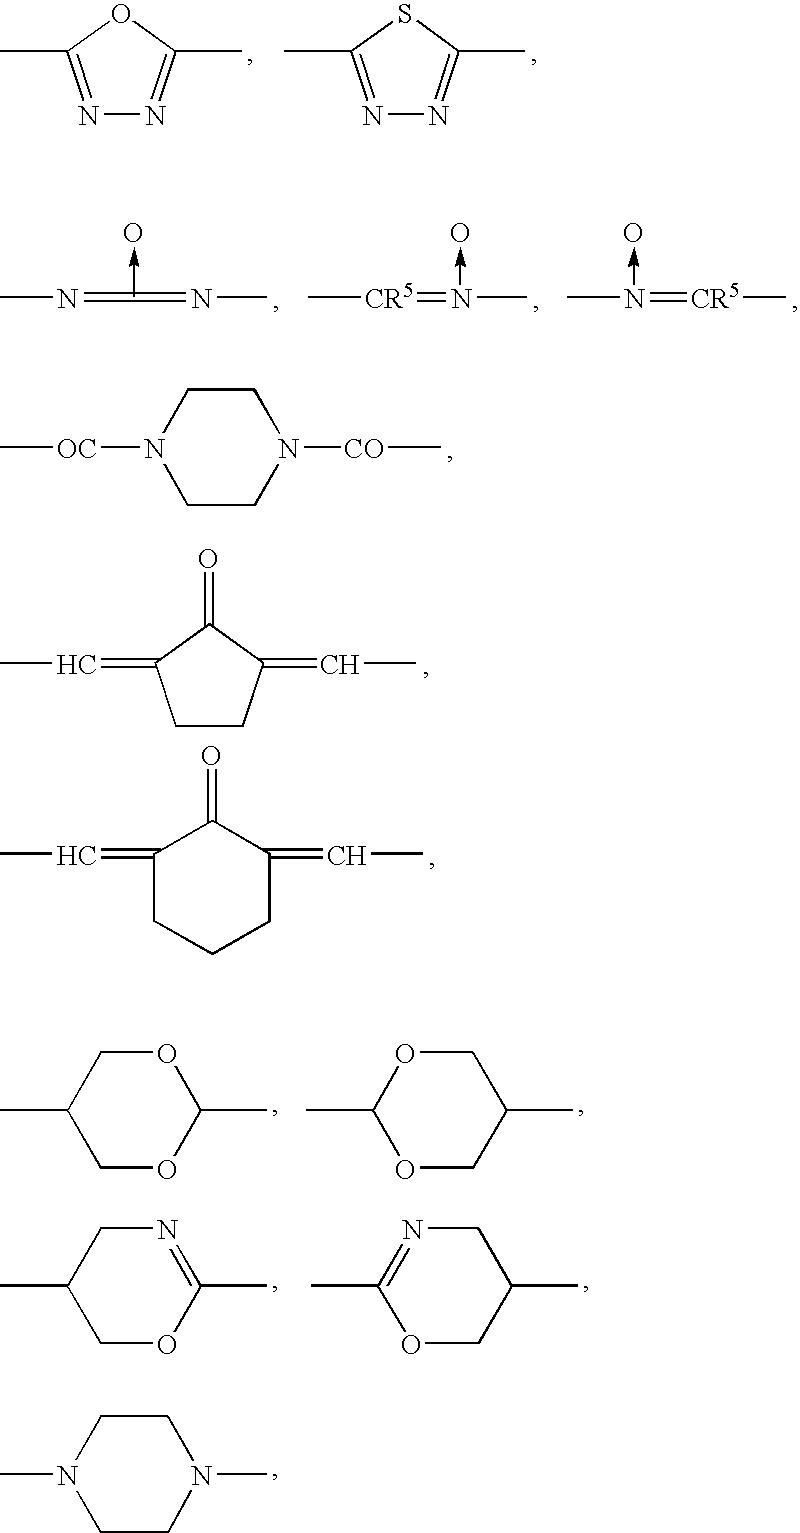 Us7585928b2 Multifunctional Monomers Containing Bound Mesogenic Wiring Diagram Neutron 9090 Fan Light Figure Us07585928 20090908 C00002